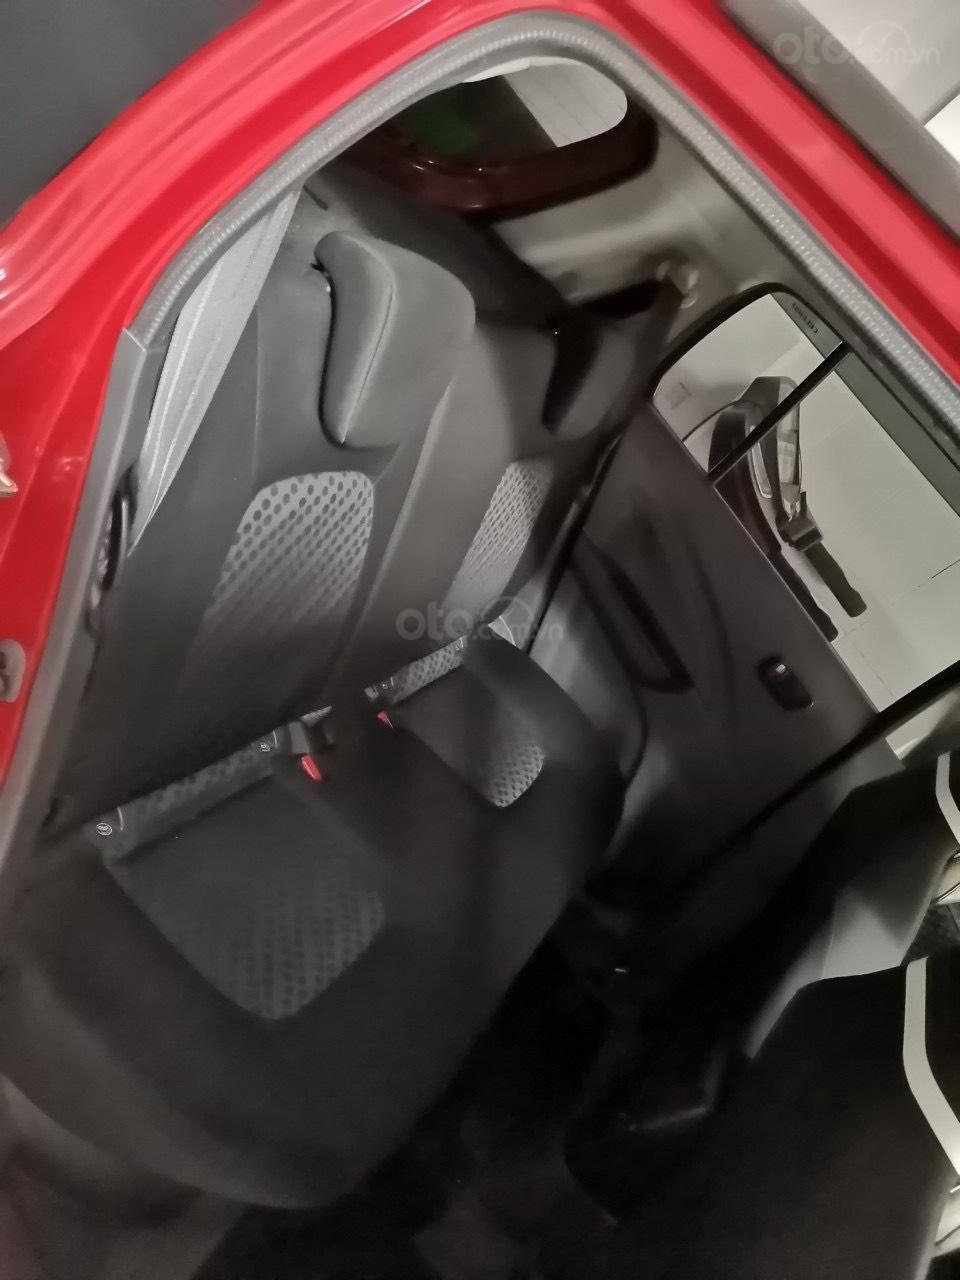 Bán nhanh chiếc Suzuki Celerio 1.0 CVT, lăn bánh 12.000km (9)